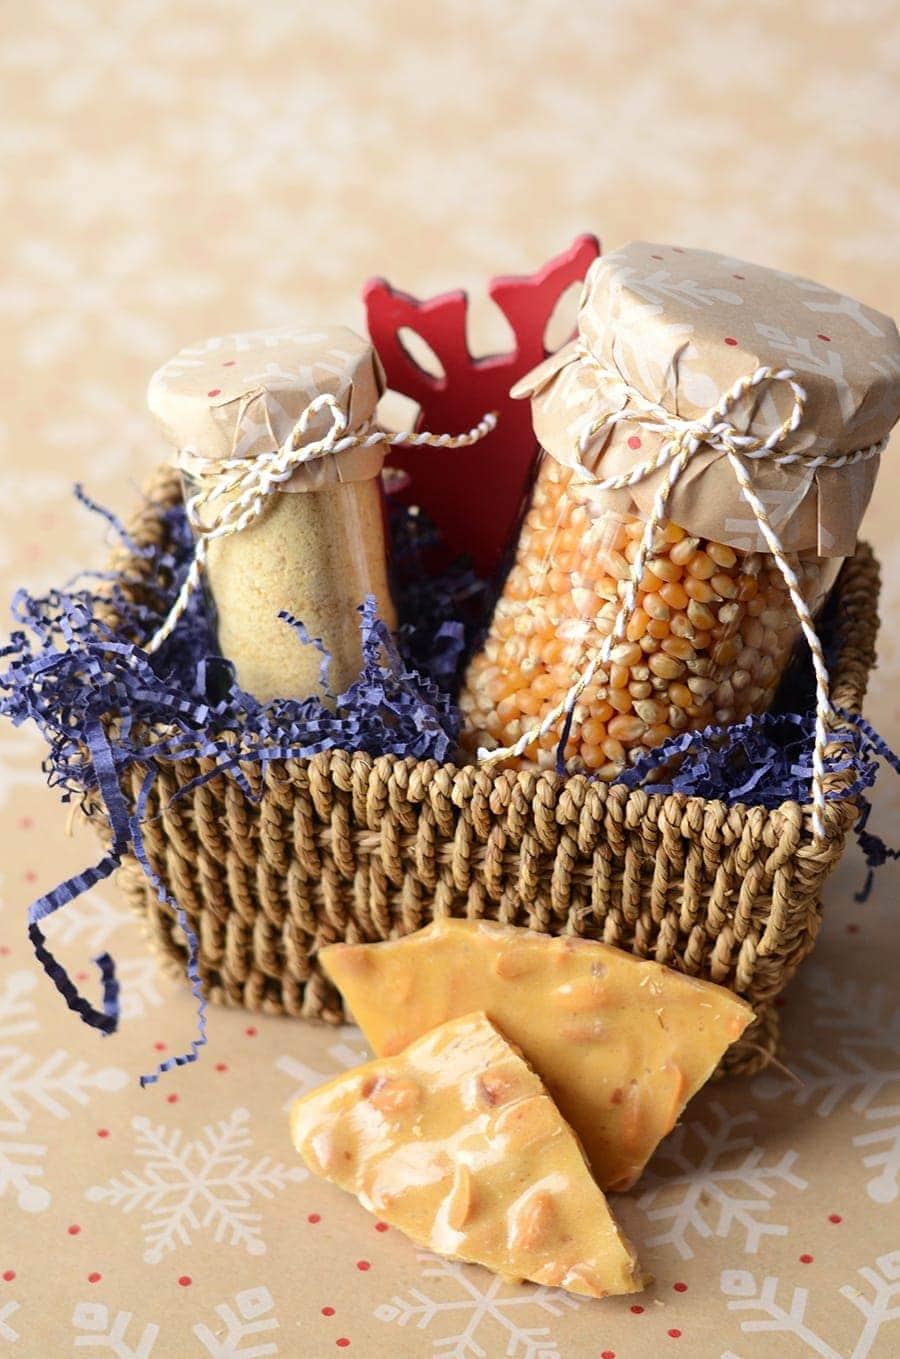 Peanut Brittle Popcorn Topping Gift Basket Web - Peanut Brittle Popcorn Topping